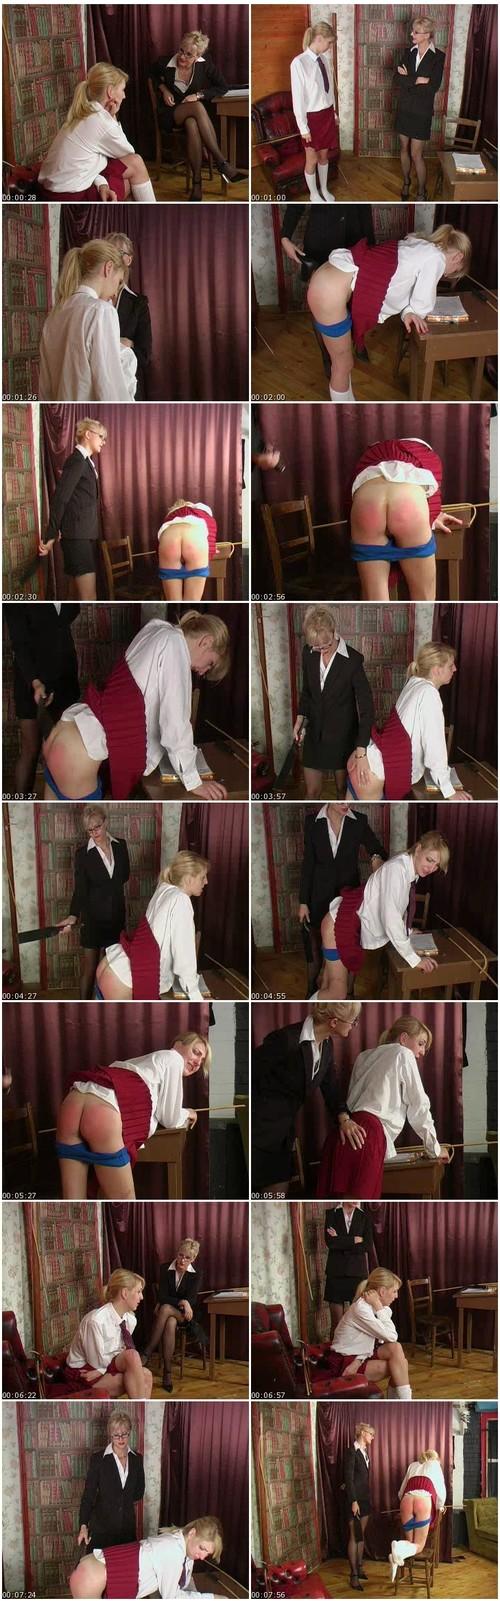 spanking153_thumb_m.jpg